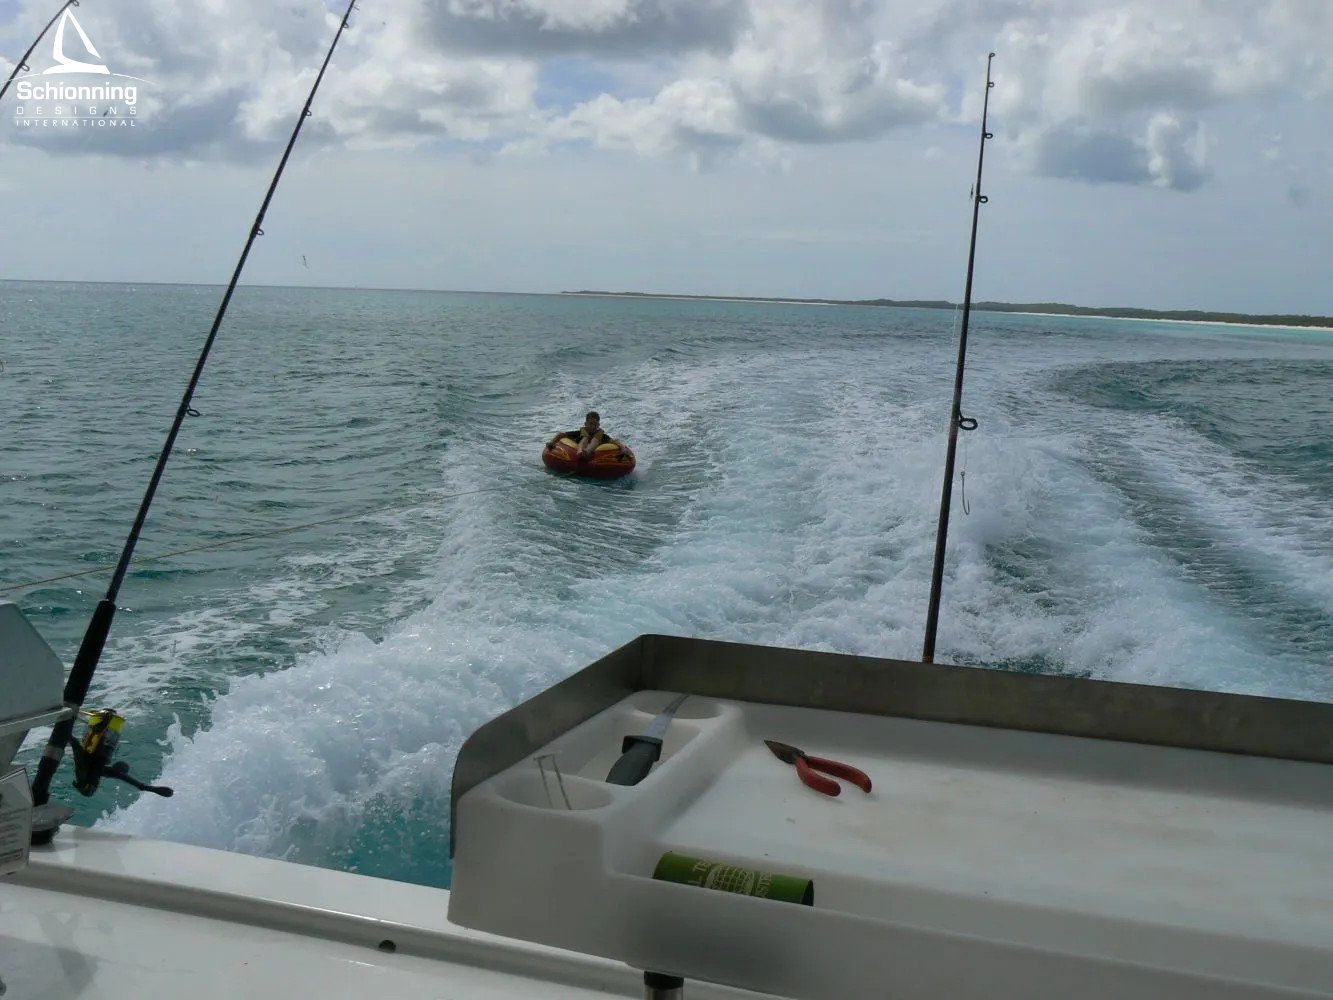 NicksHol Growler 950 VT Power Catamaran - SDI - Schionning Designs International